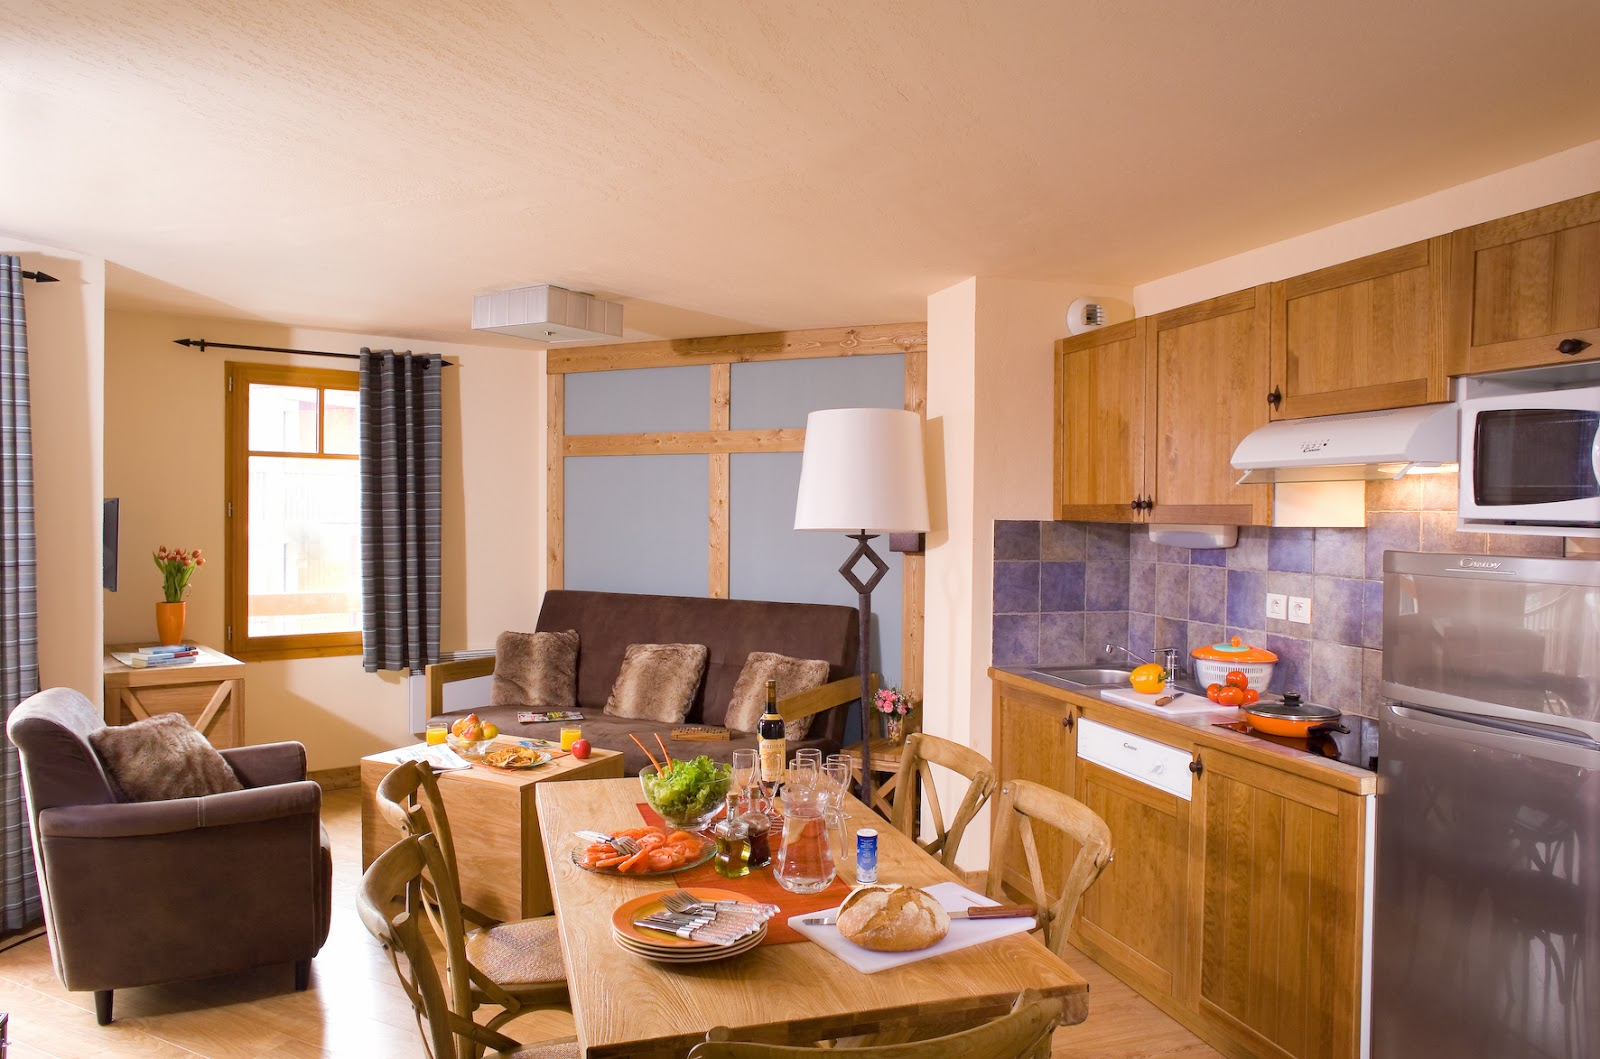 Interior of self-catered ski apartment, Cami Real